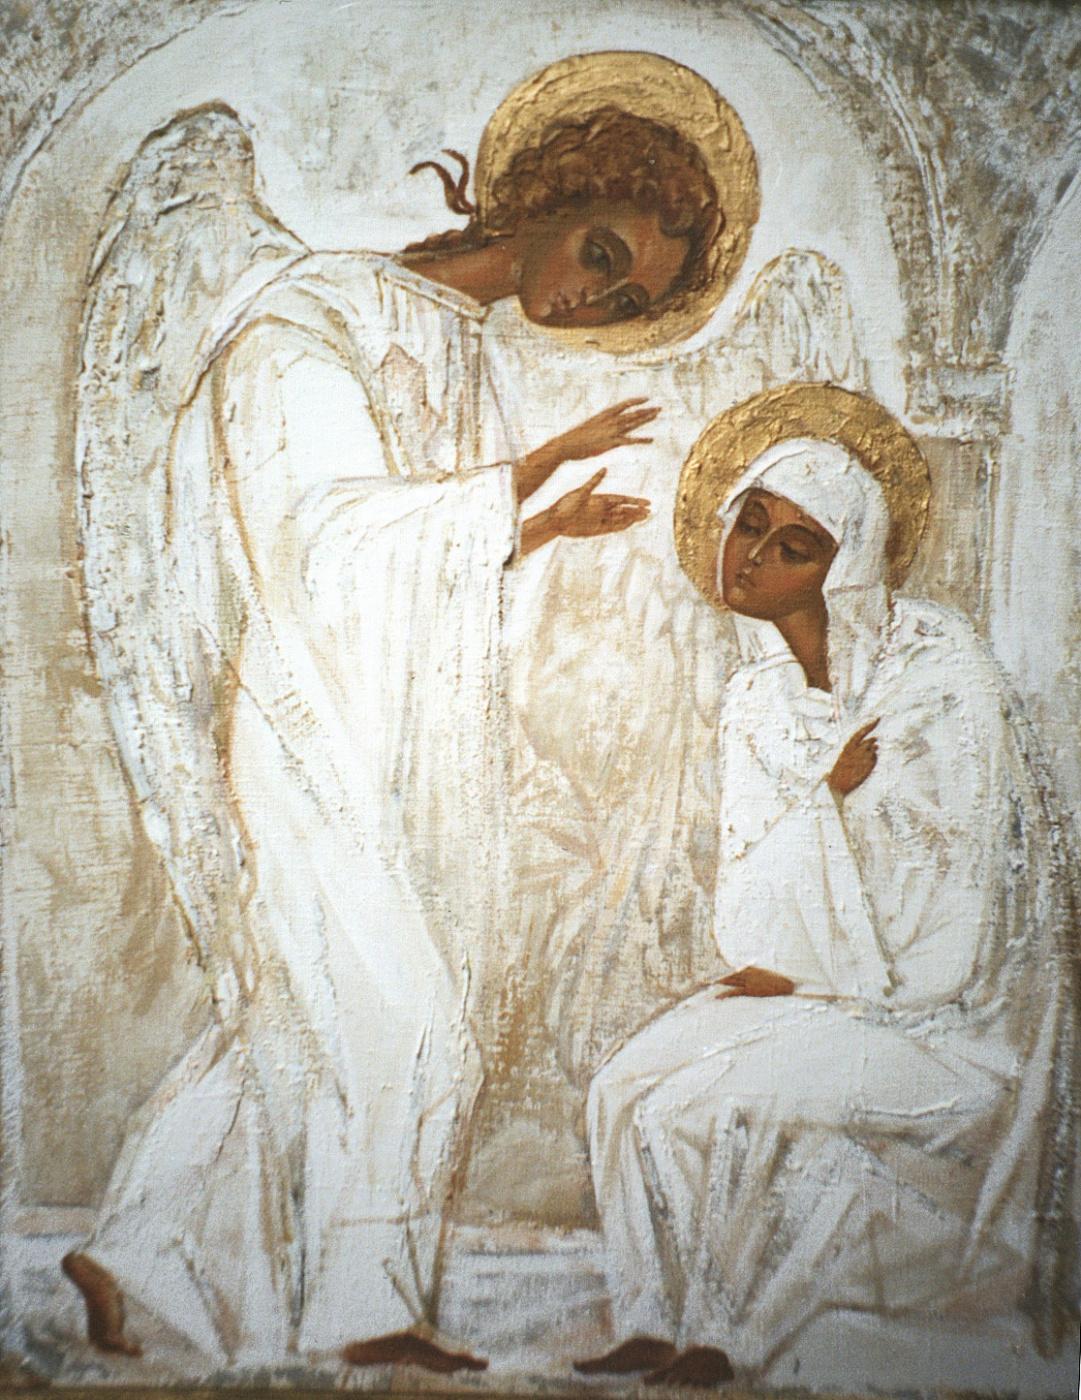 Mikhail Sergeevich Smirnov. The Annunciation